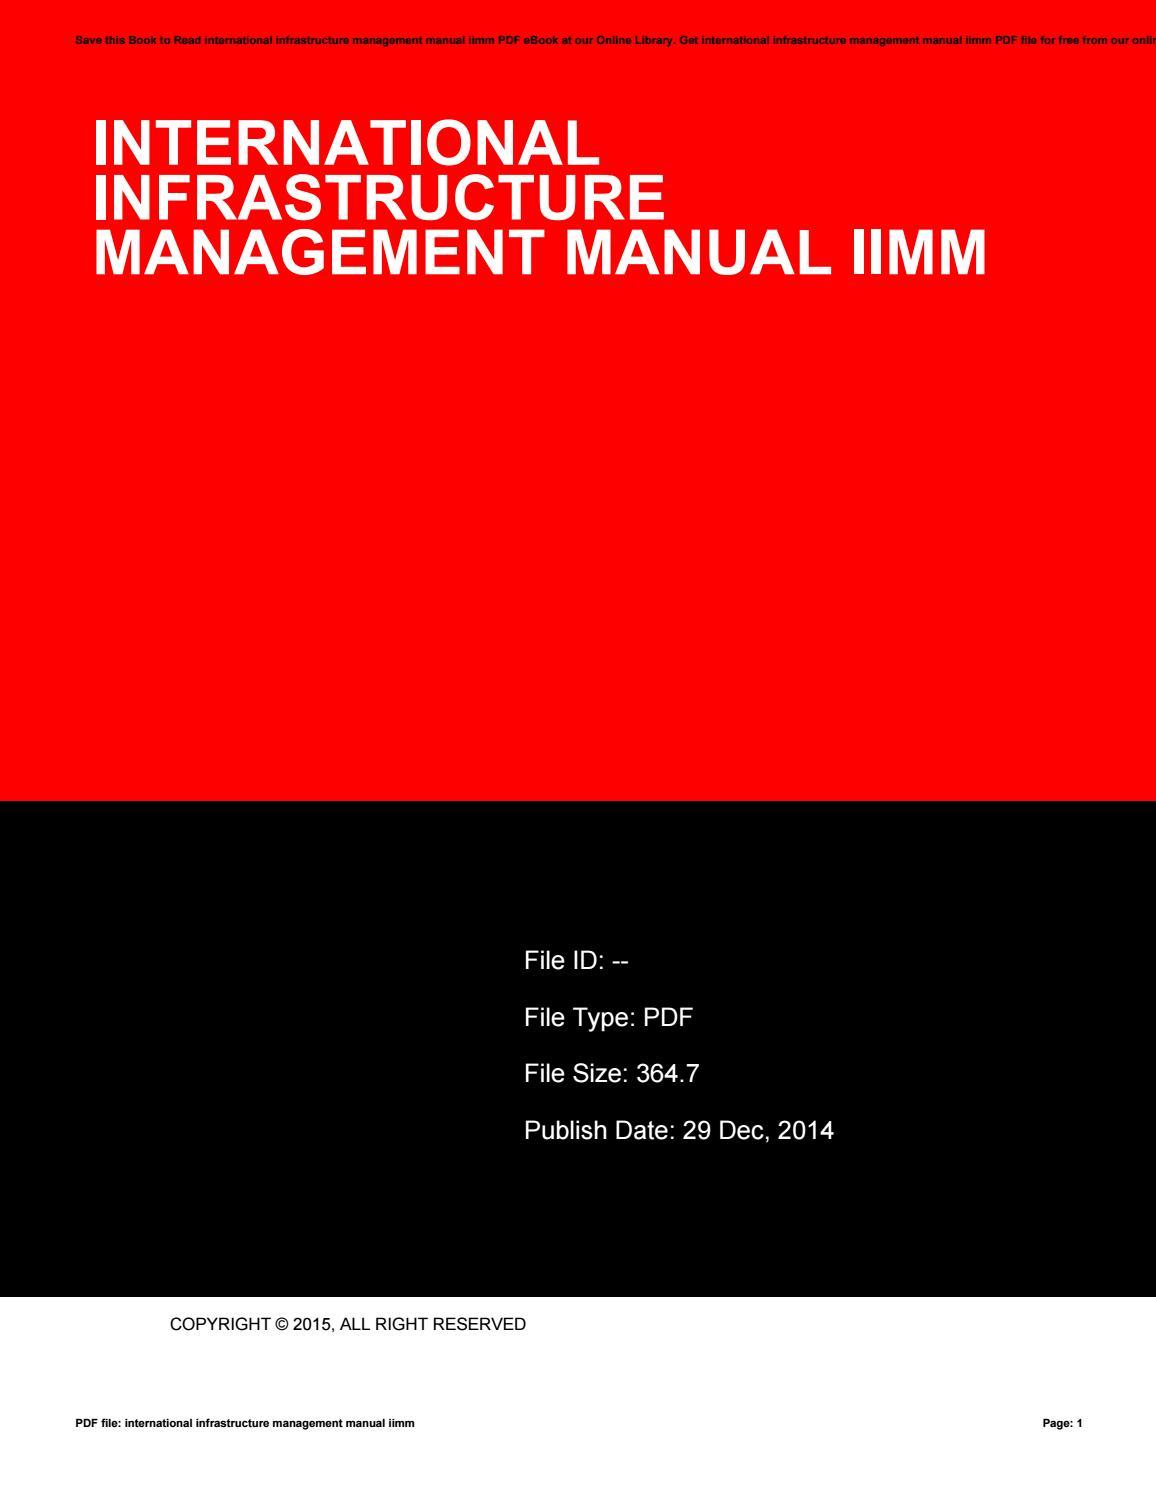 International infrastructure management manual iimm by CarolynGrunewald4327  - issuu